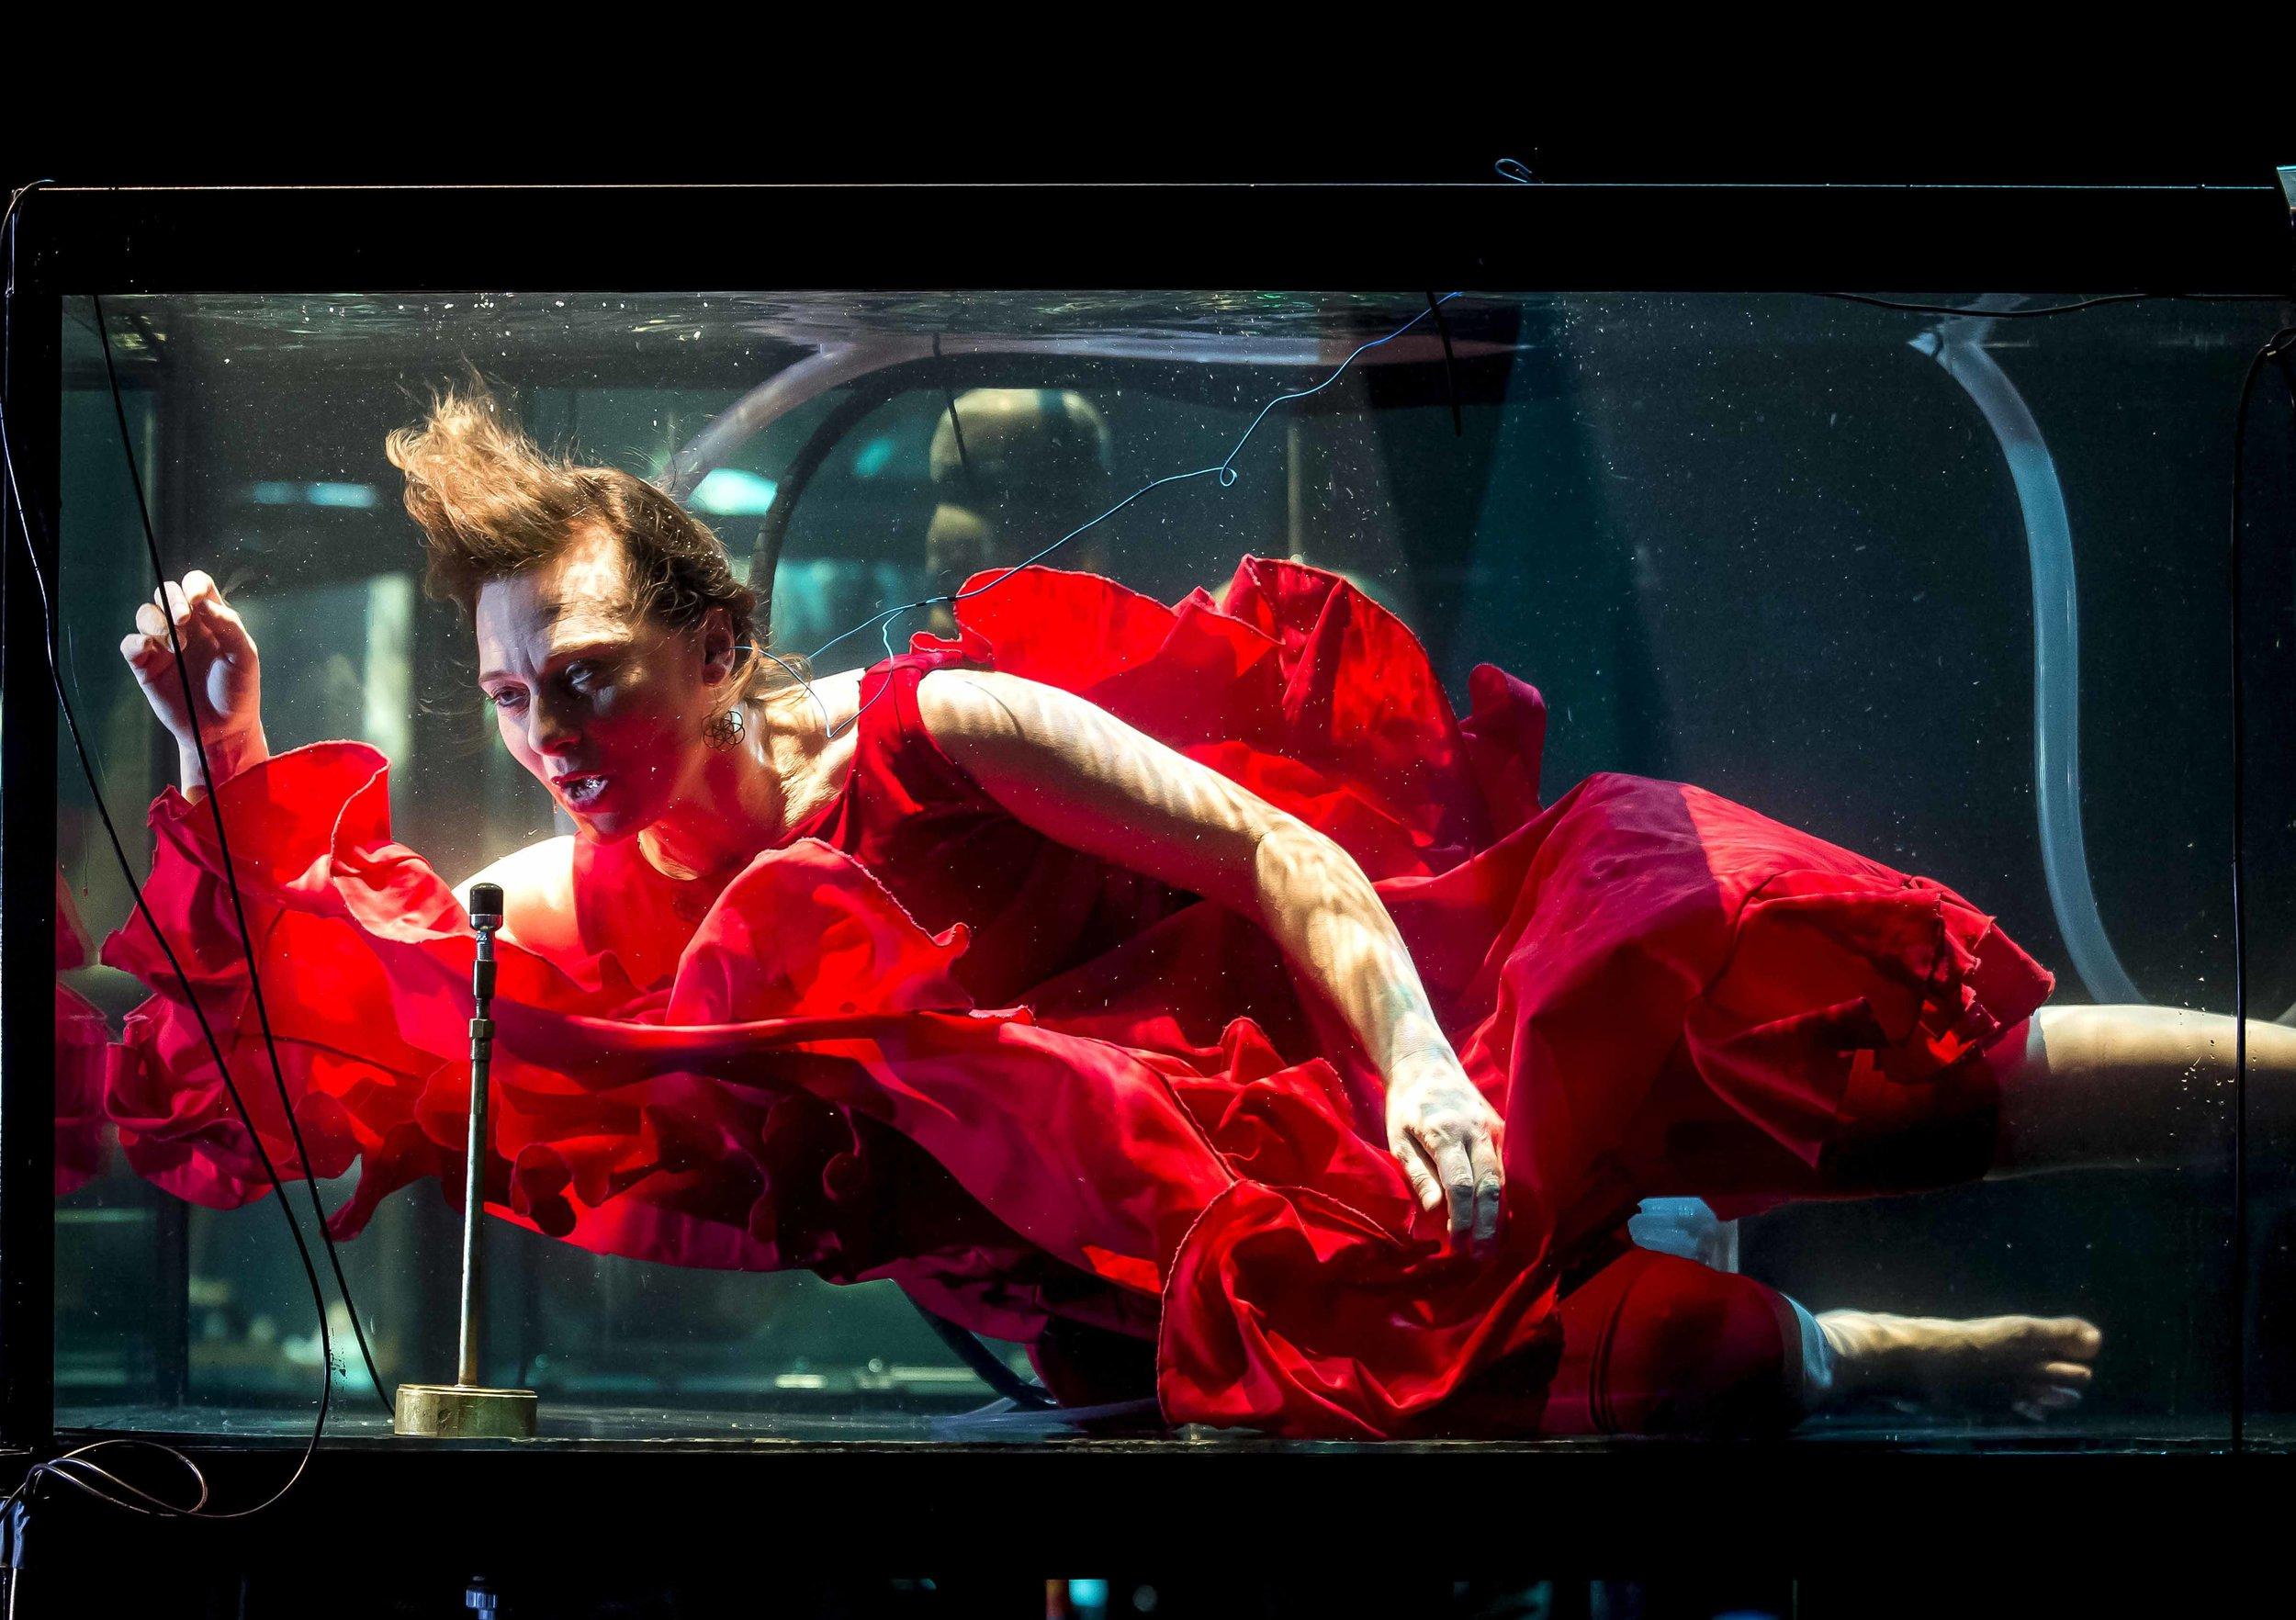 Soaking soprano - underwater concert E.jpg